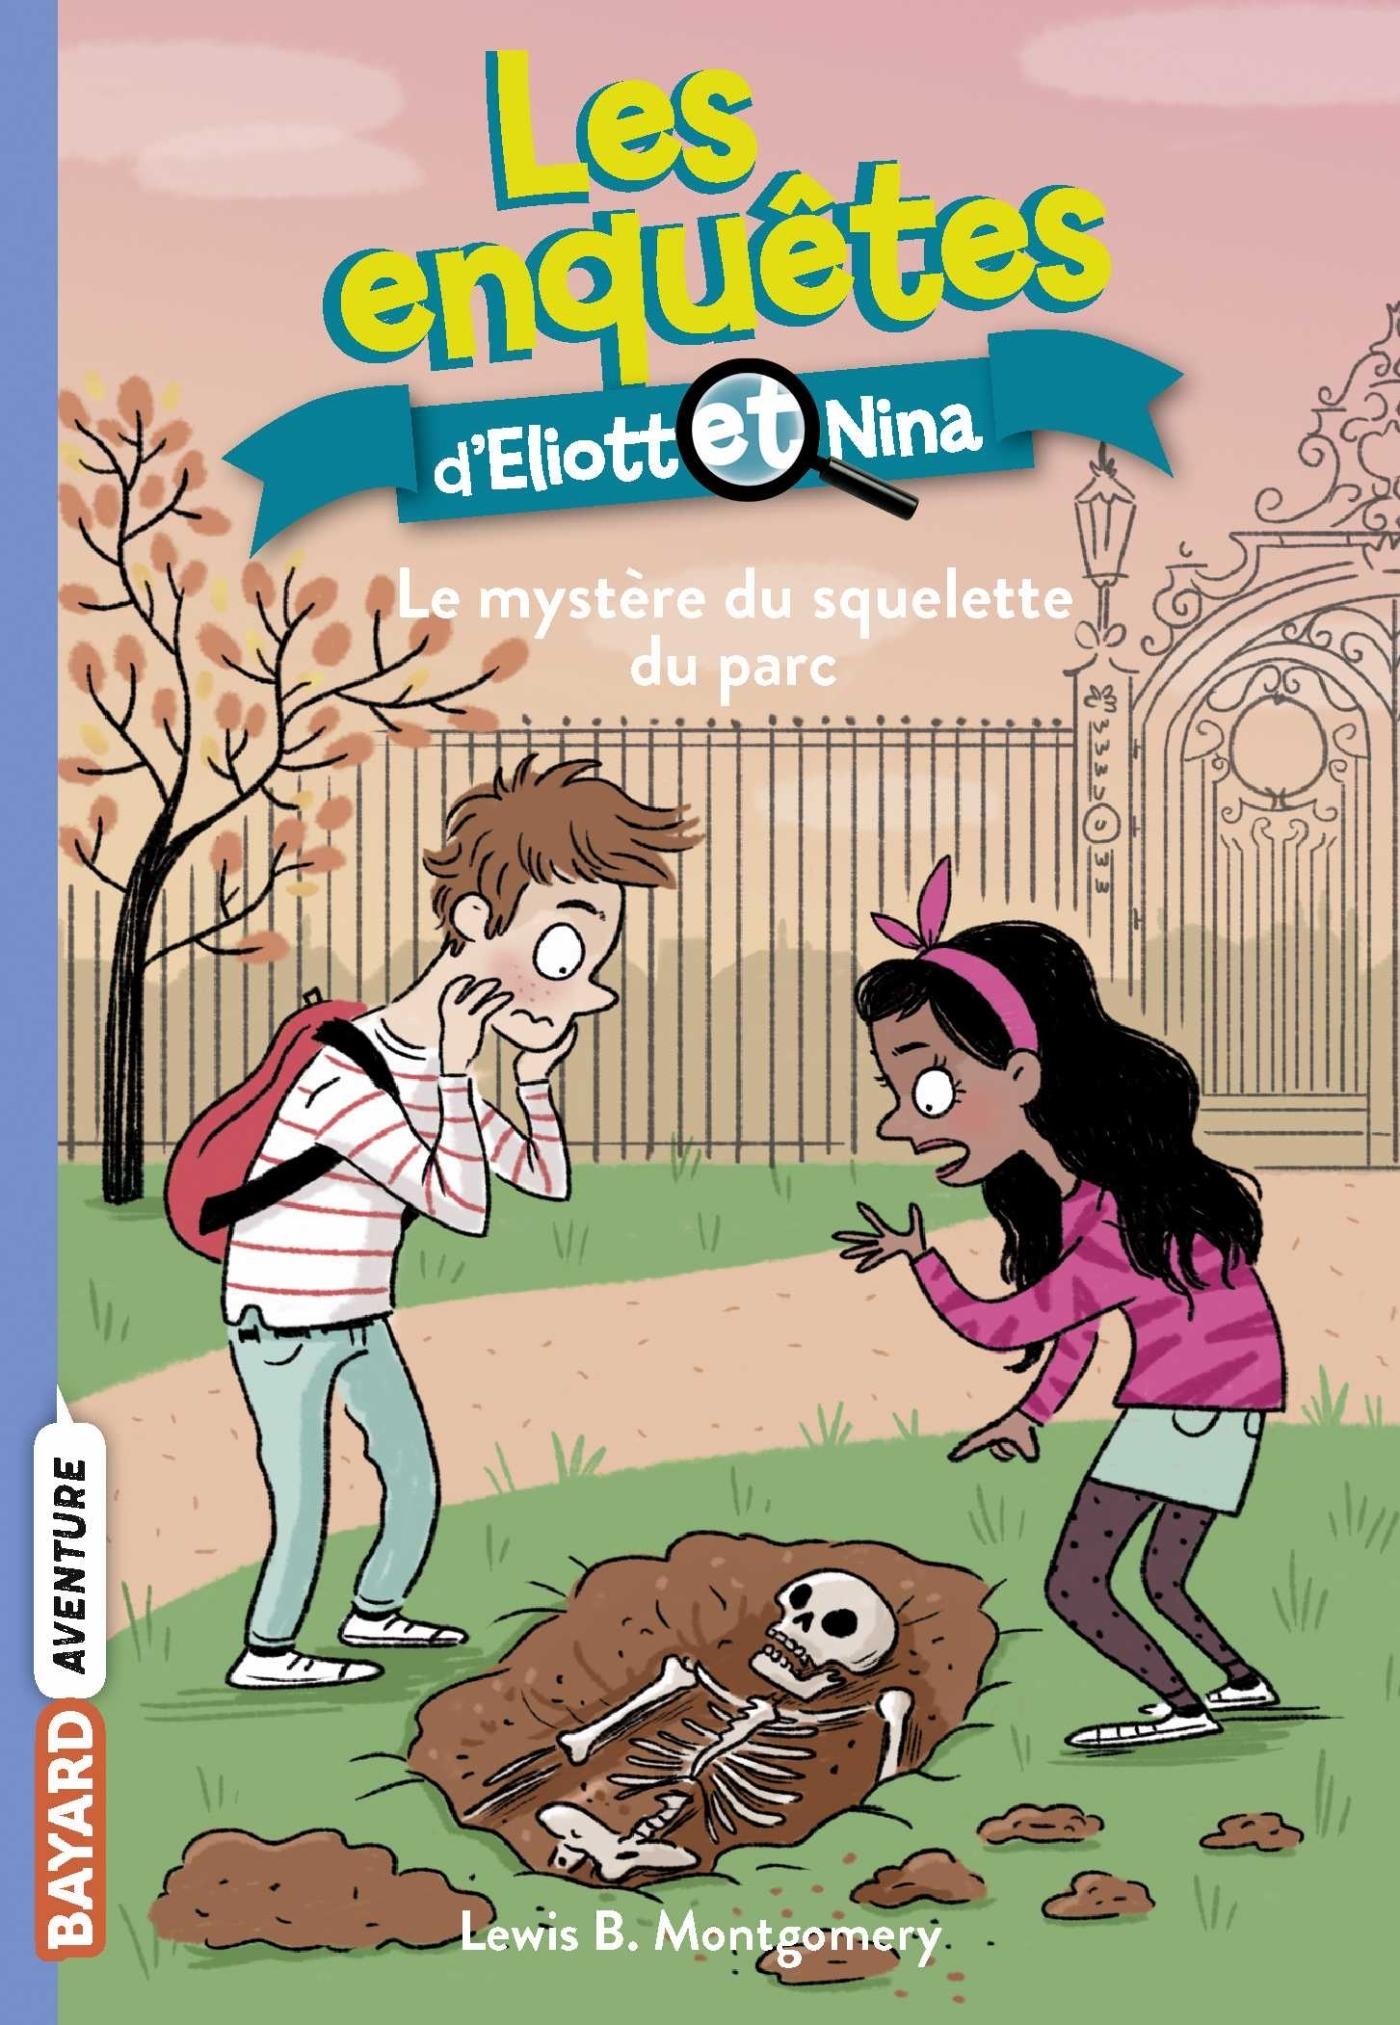 LES ENQUETES D'ELIOTT ET NINA, TOME 12